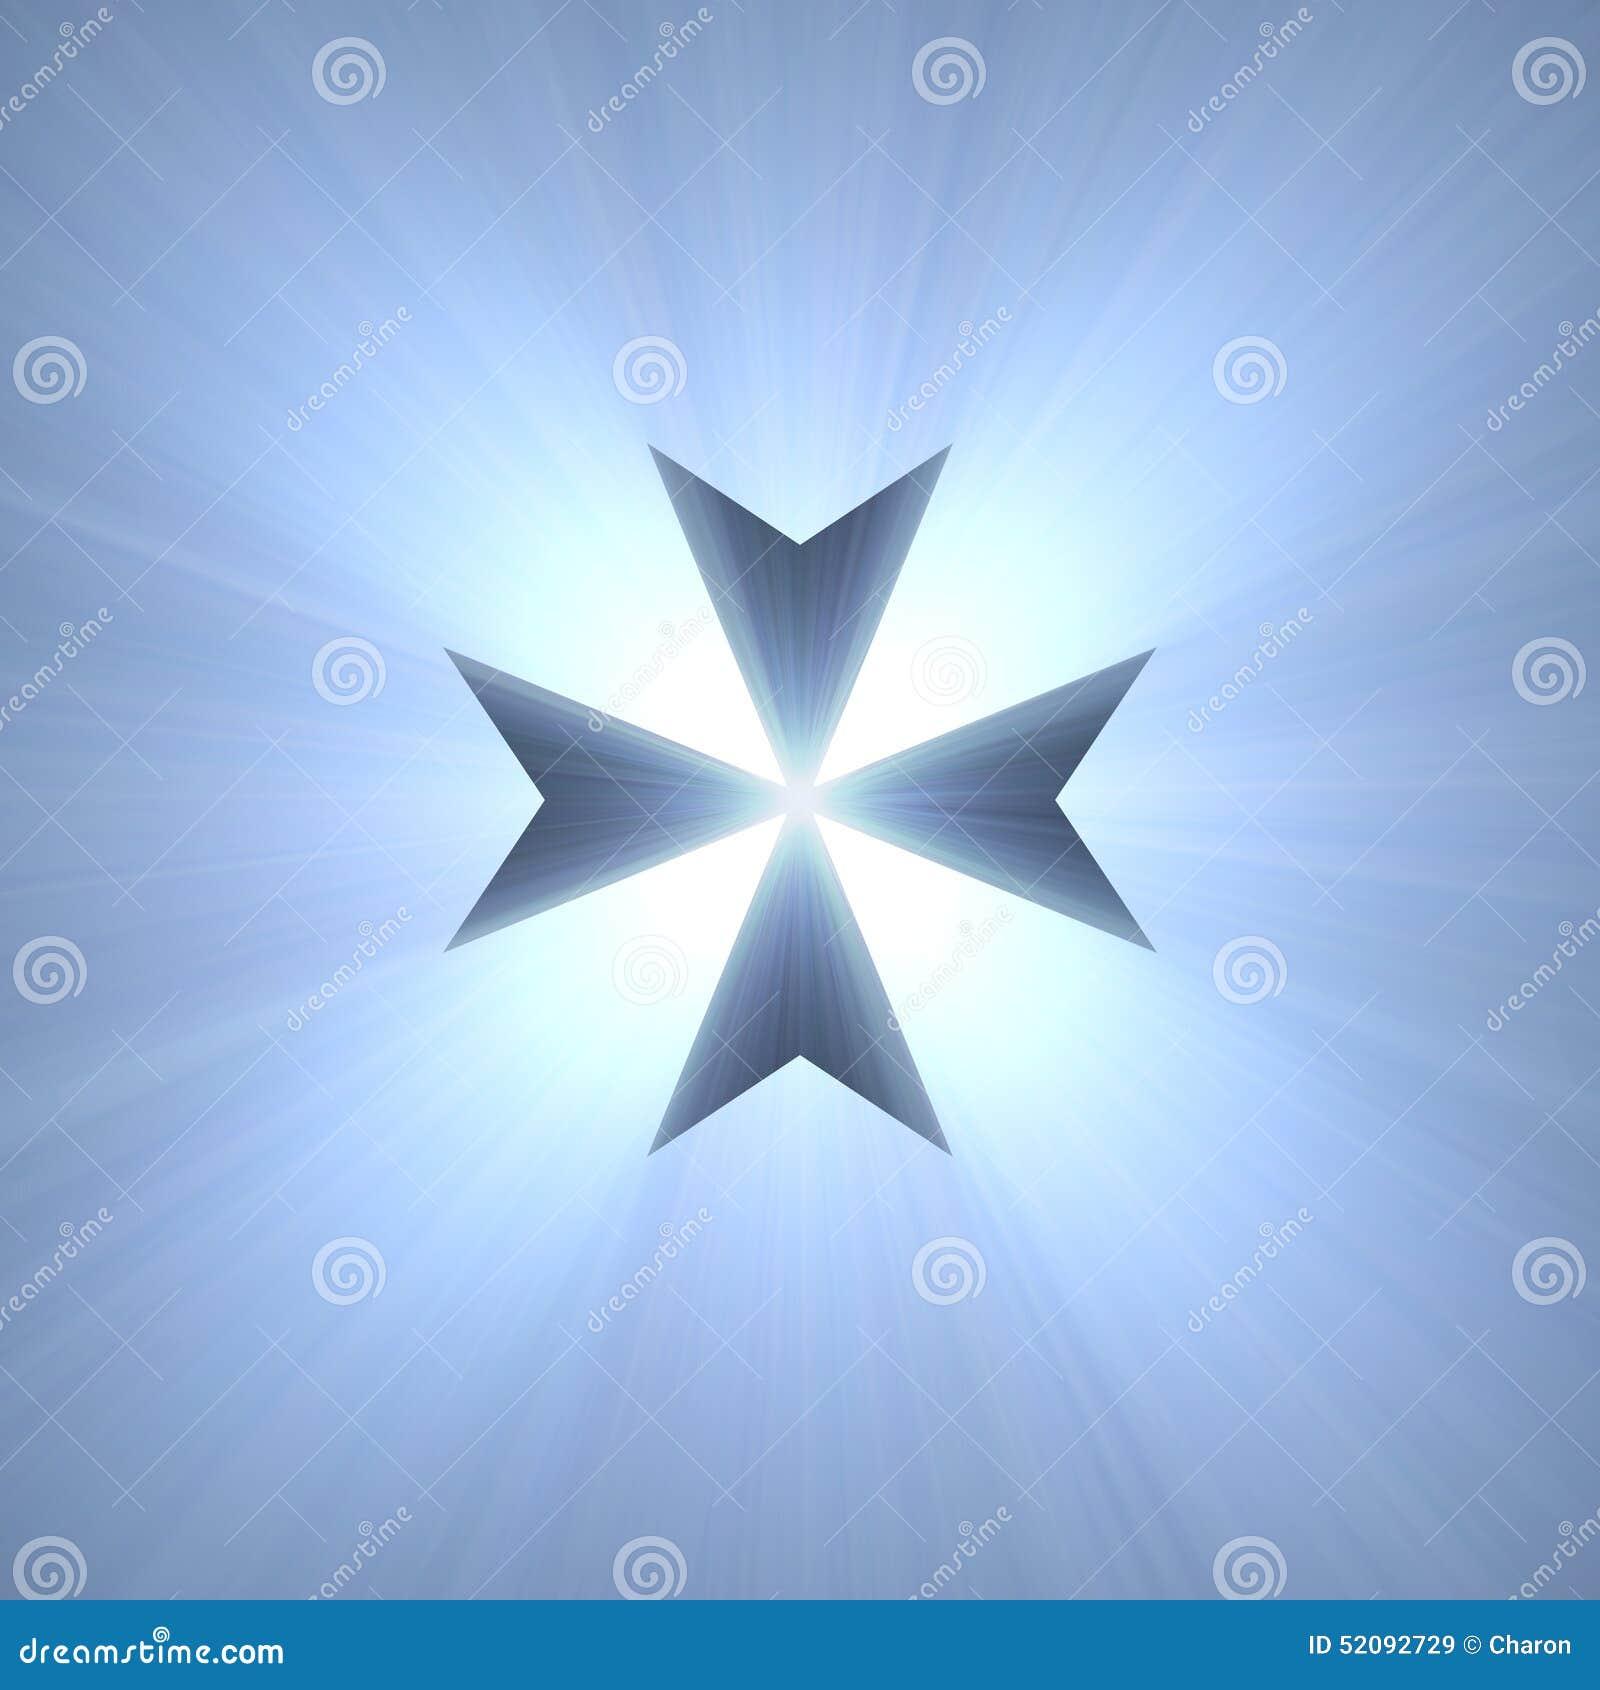 Maltese cross symbol blue light flare stock illustration image maltese cross symbol blue light flare biocorpaavc